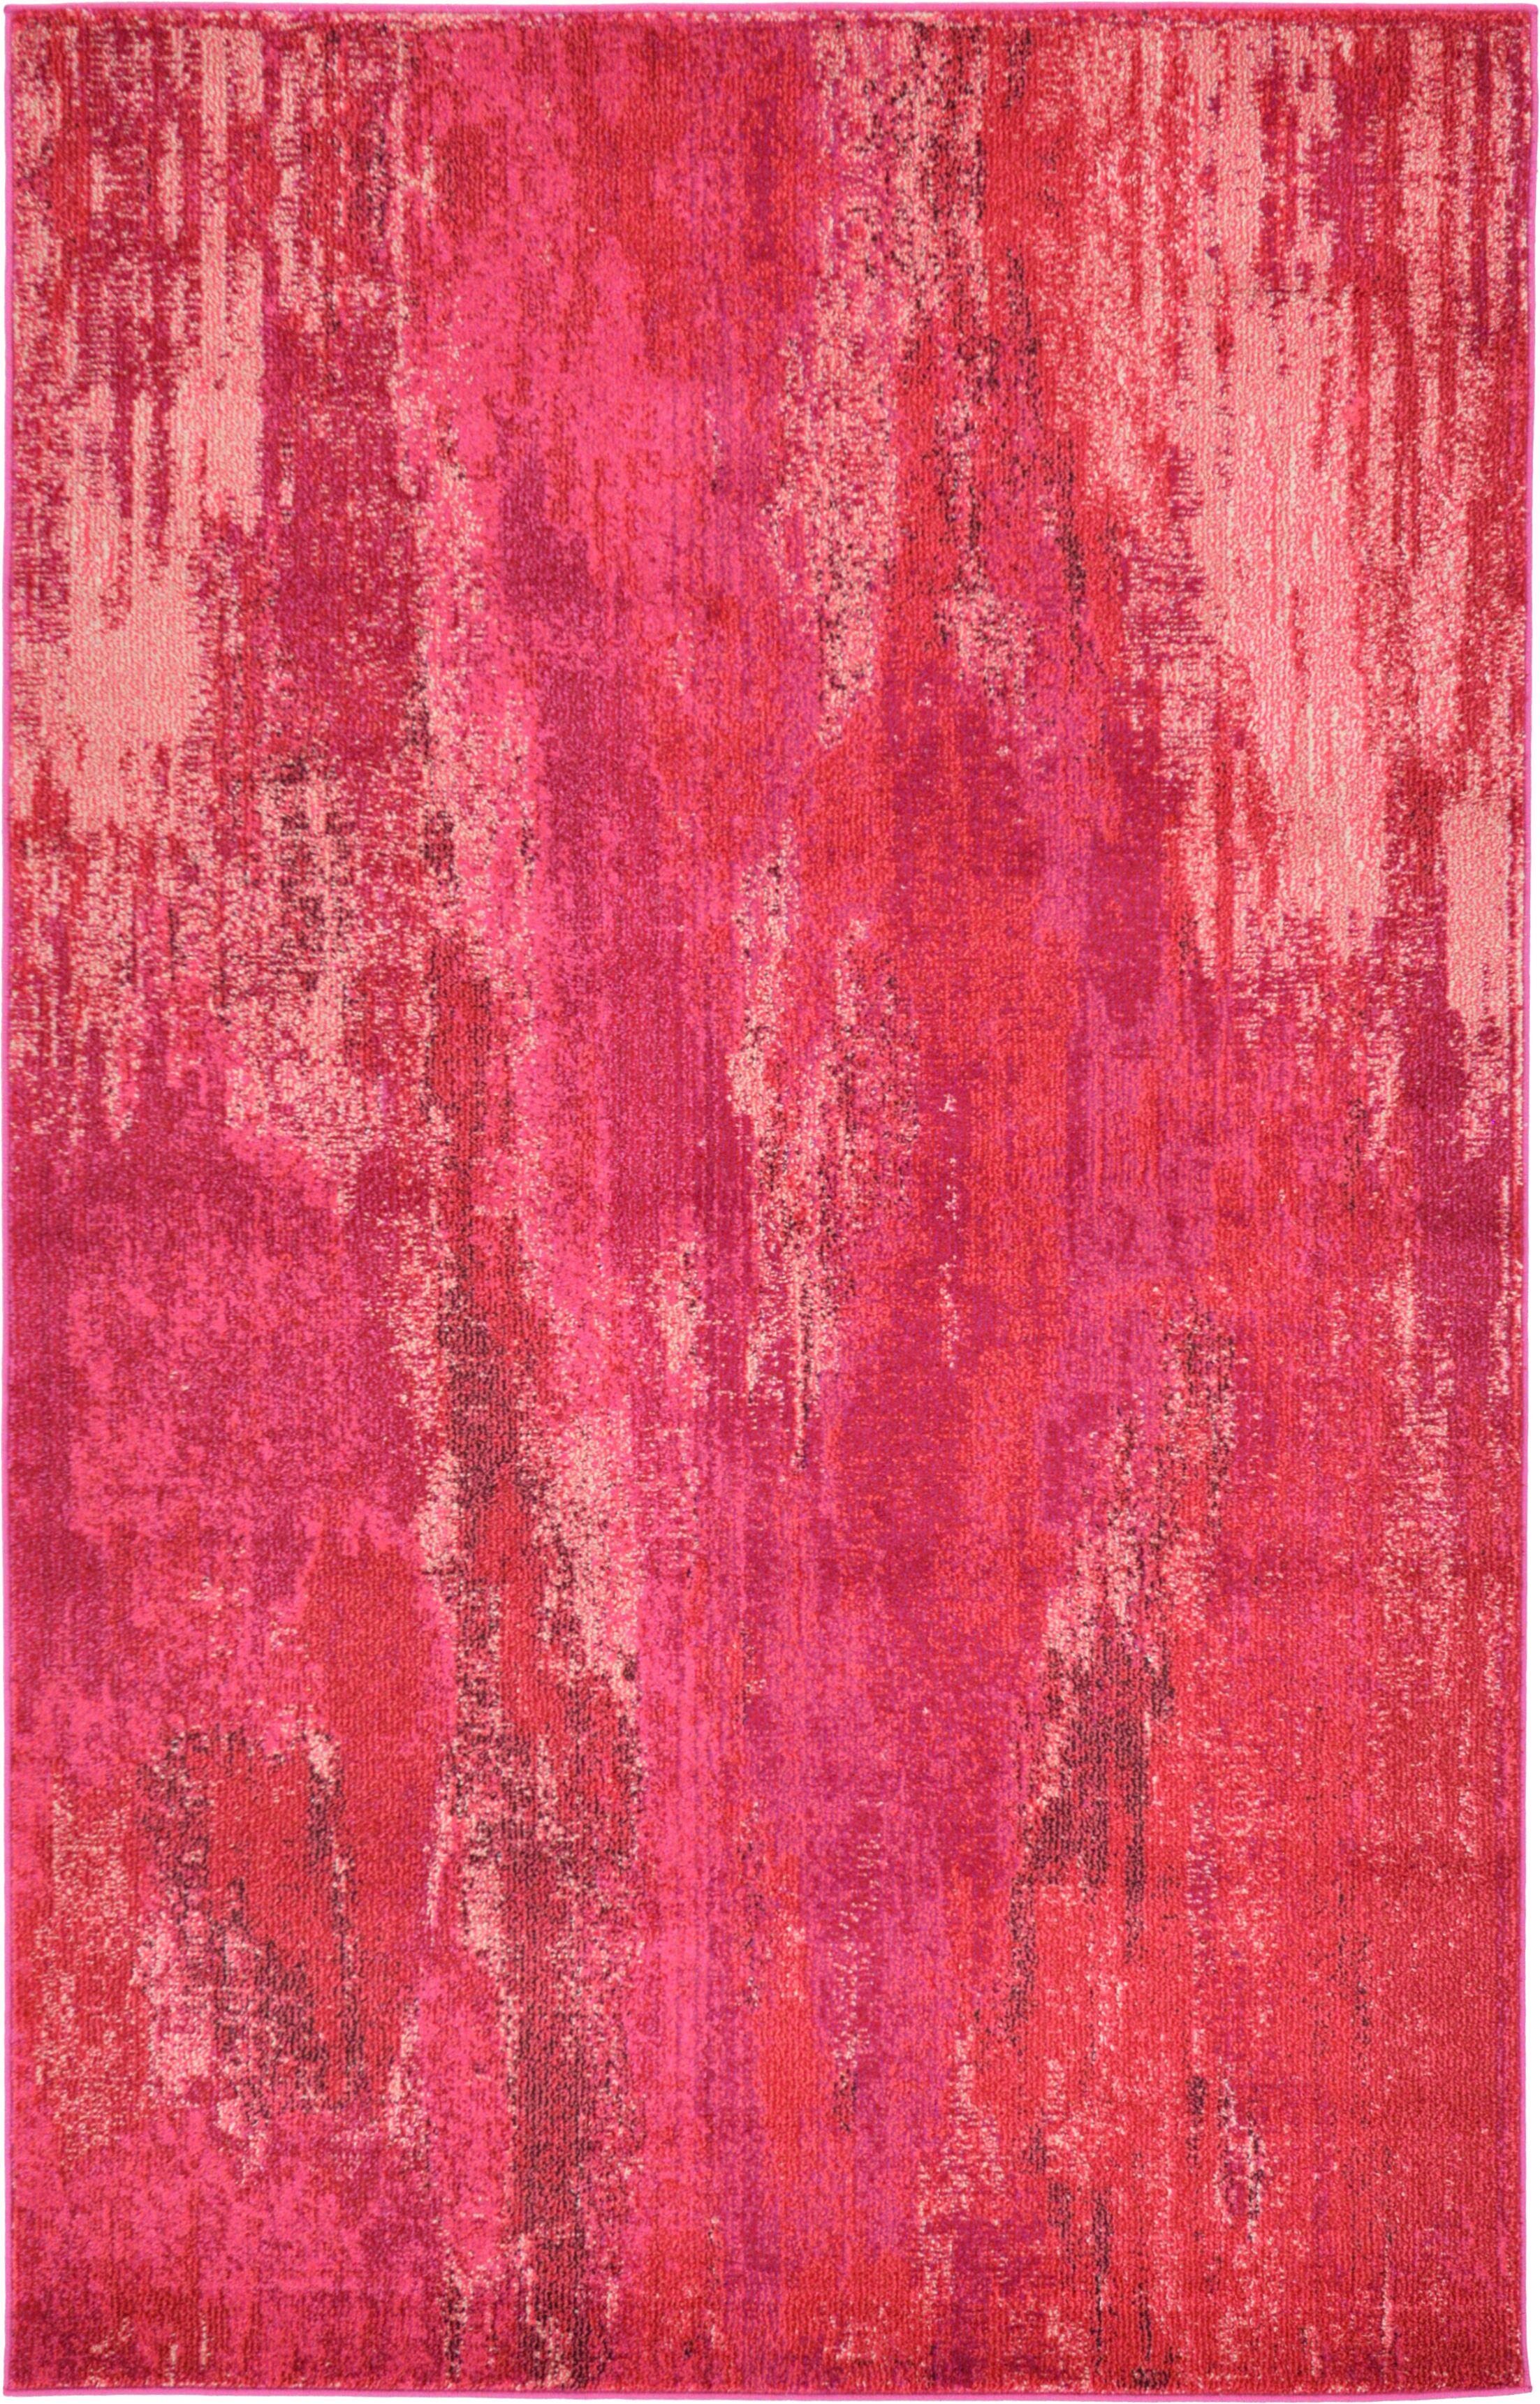 Killington Pink Area Rug Rug Size: Rectangle 5' x 8'